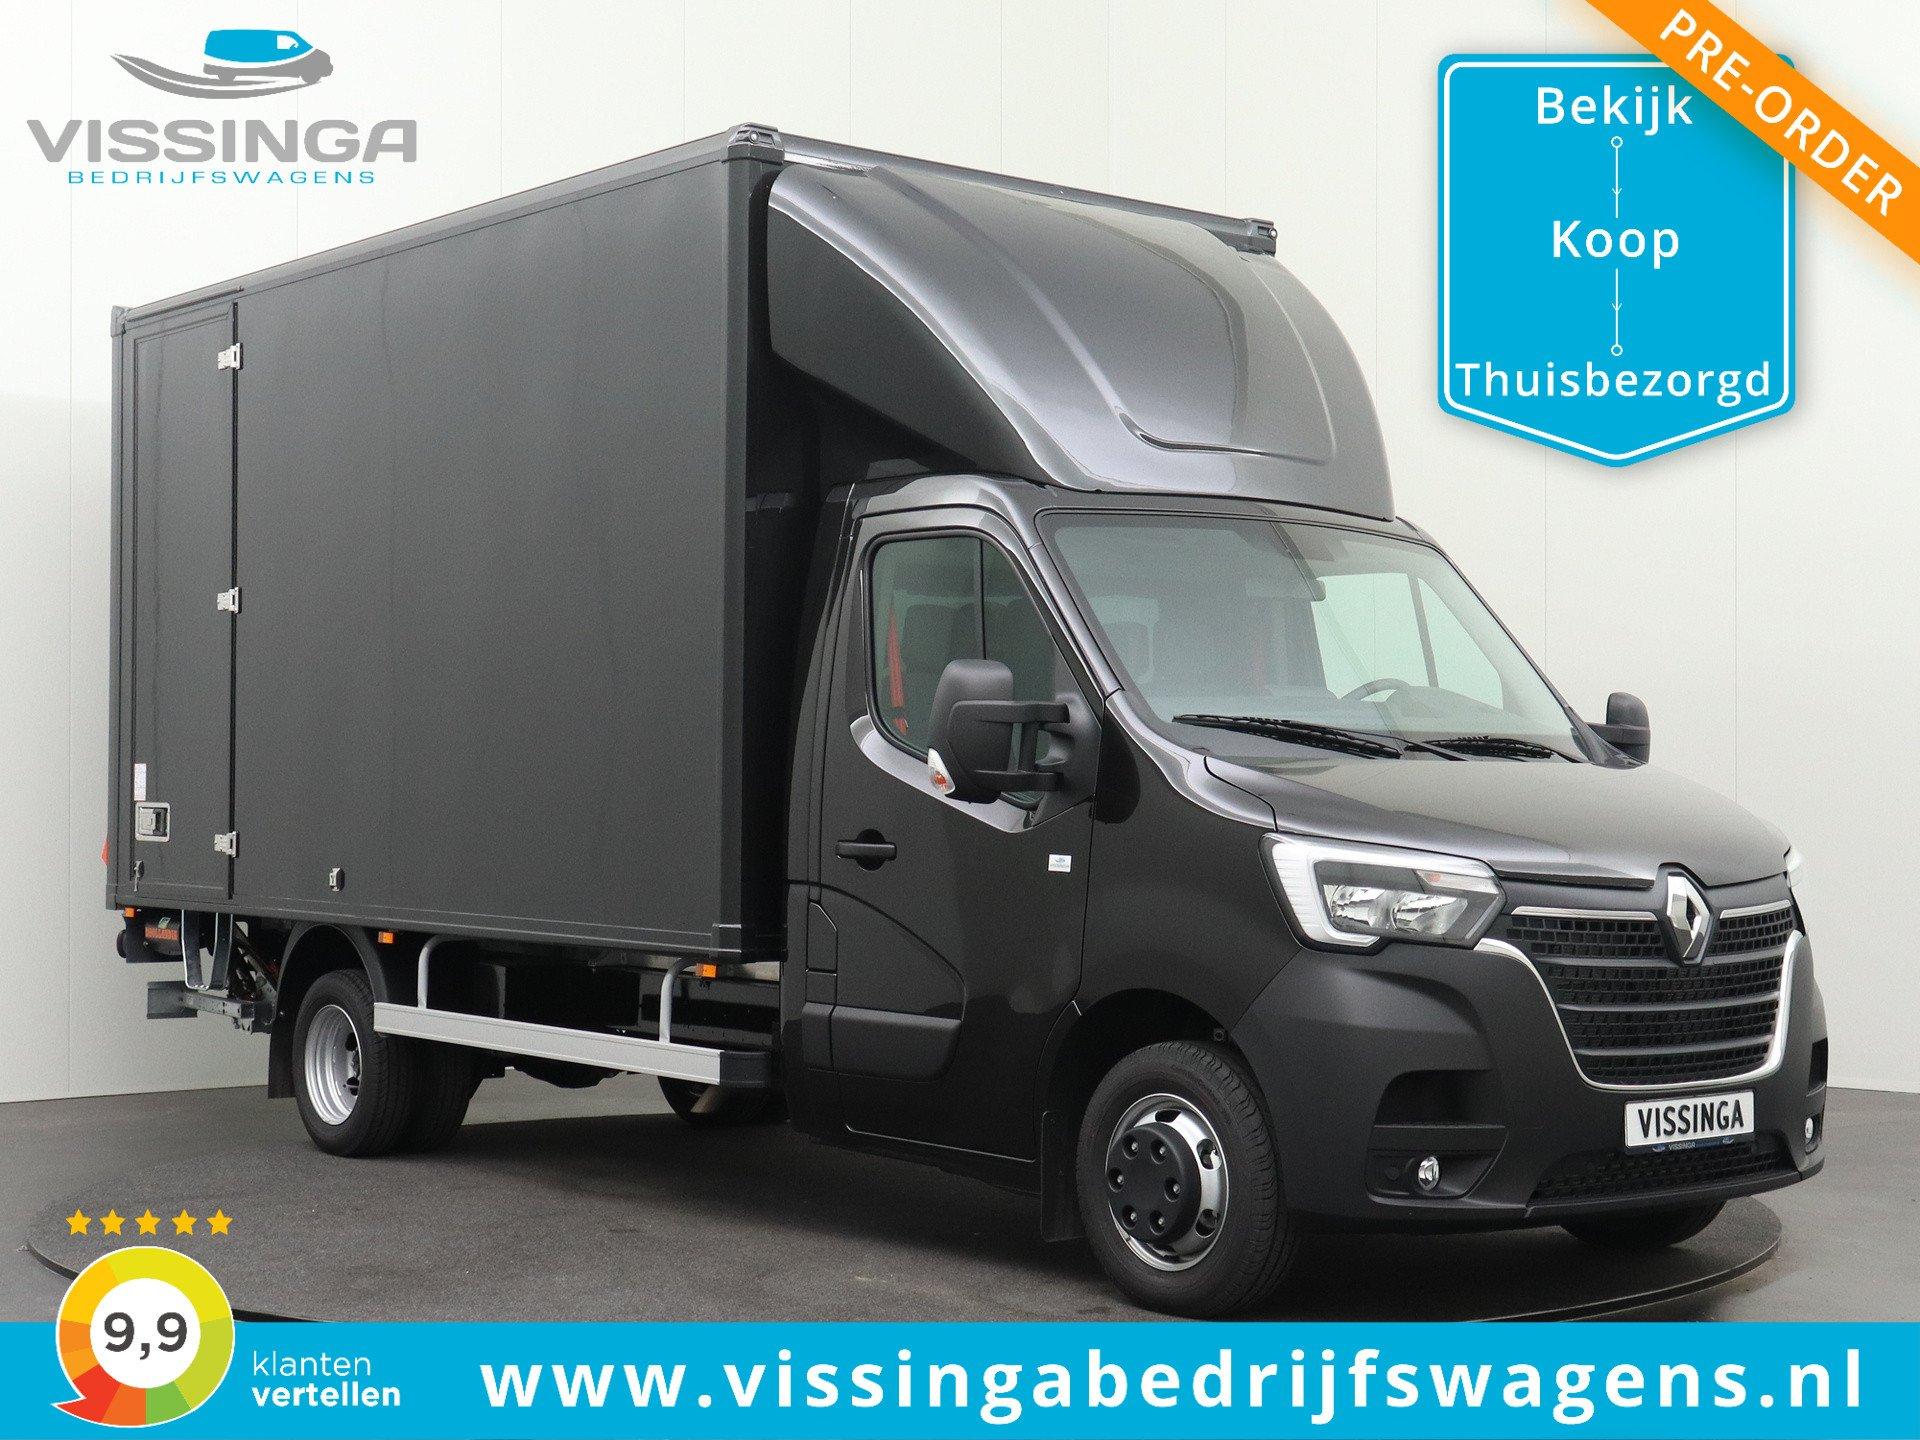 Renault Master RWD 165 pk Bakwagen 440x211x232 (21.5 m3)